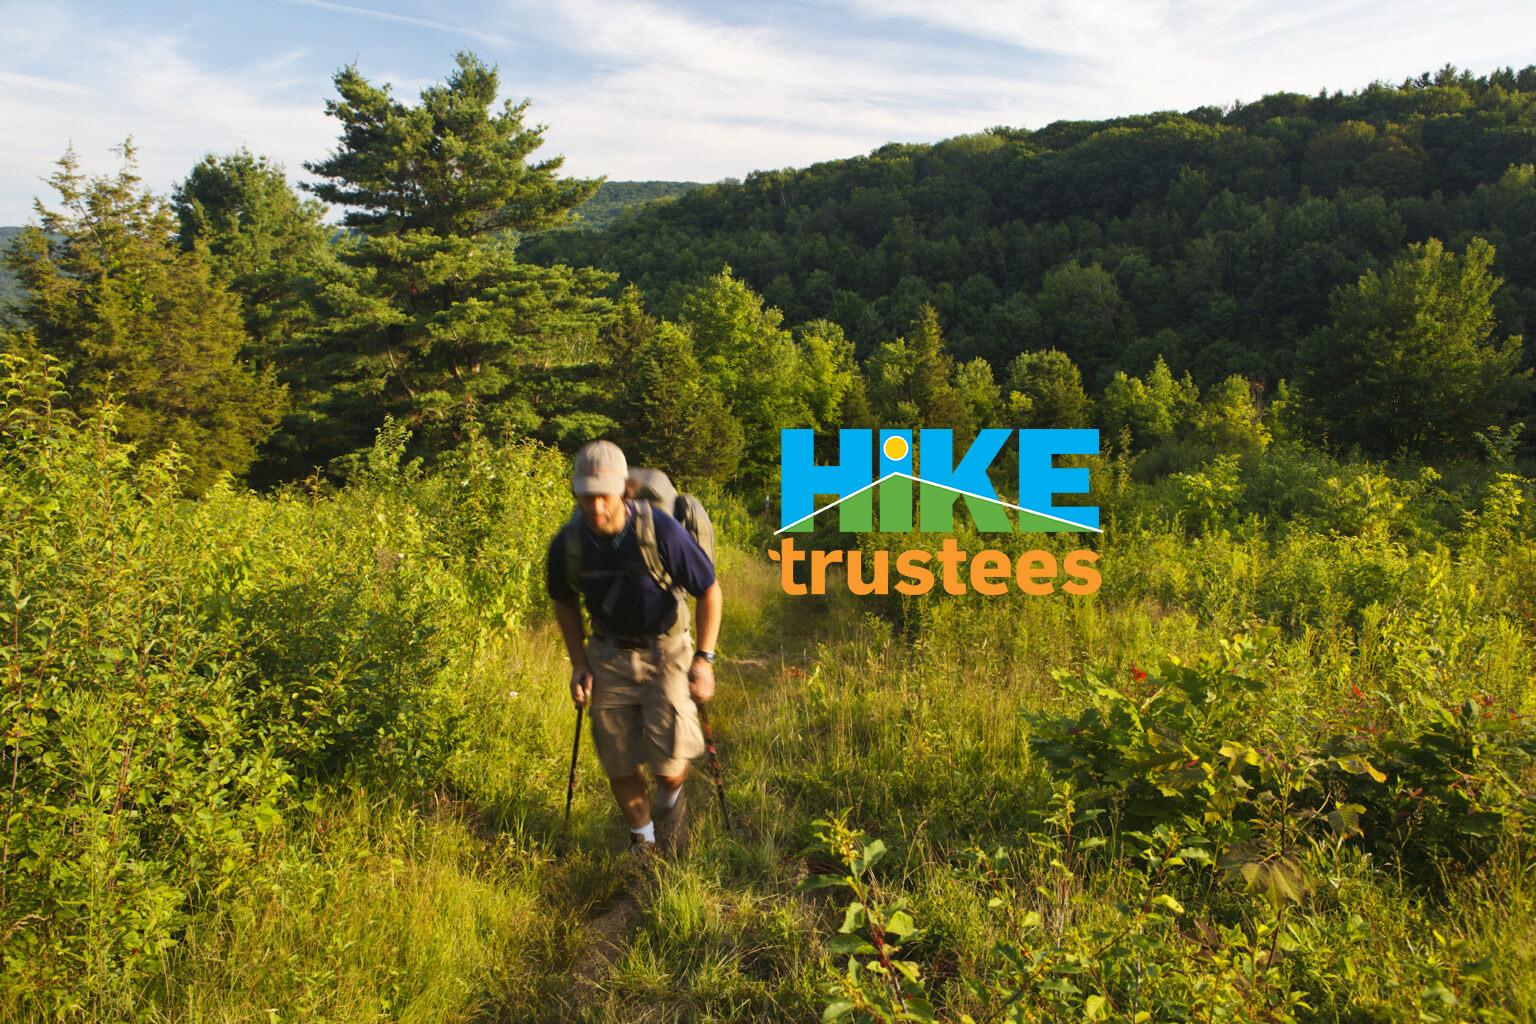 Massachusetts Hiking Challenge